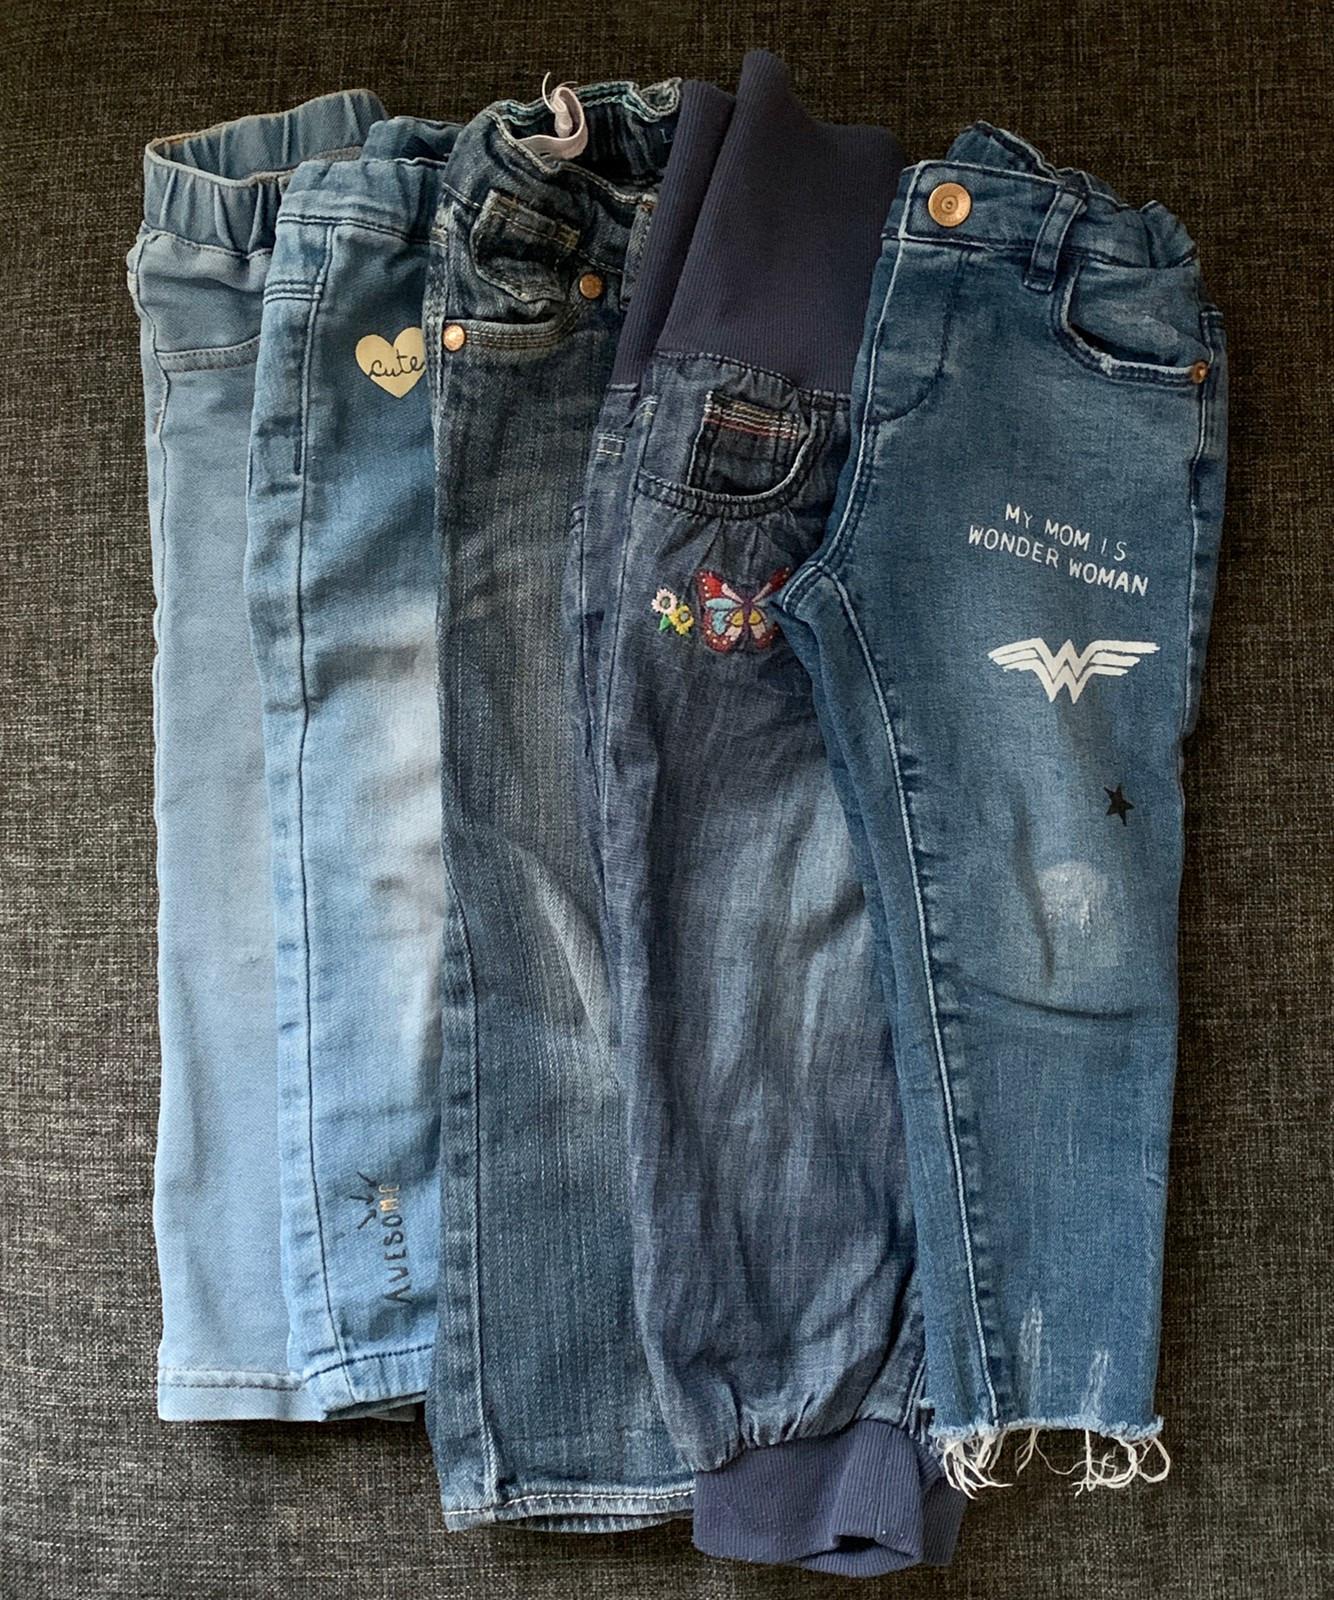 5 stk. Jeans bukser til barn Levi's, Name it, Zara, H&M str